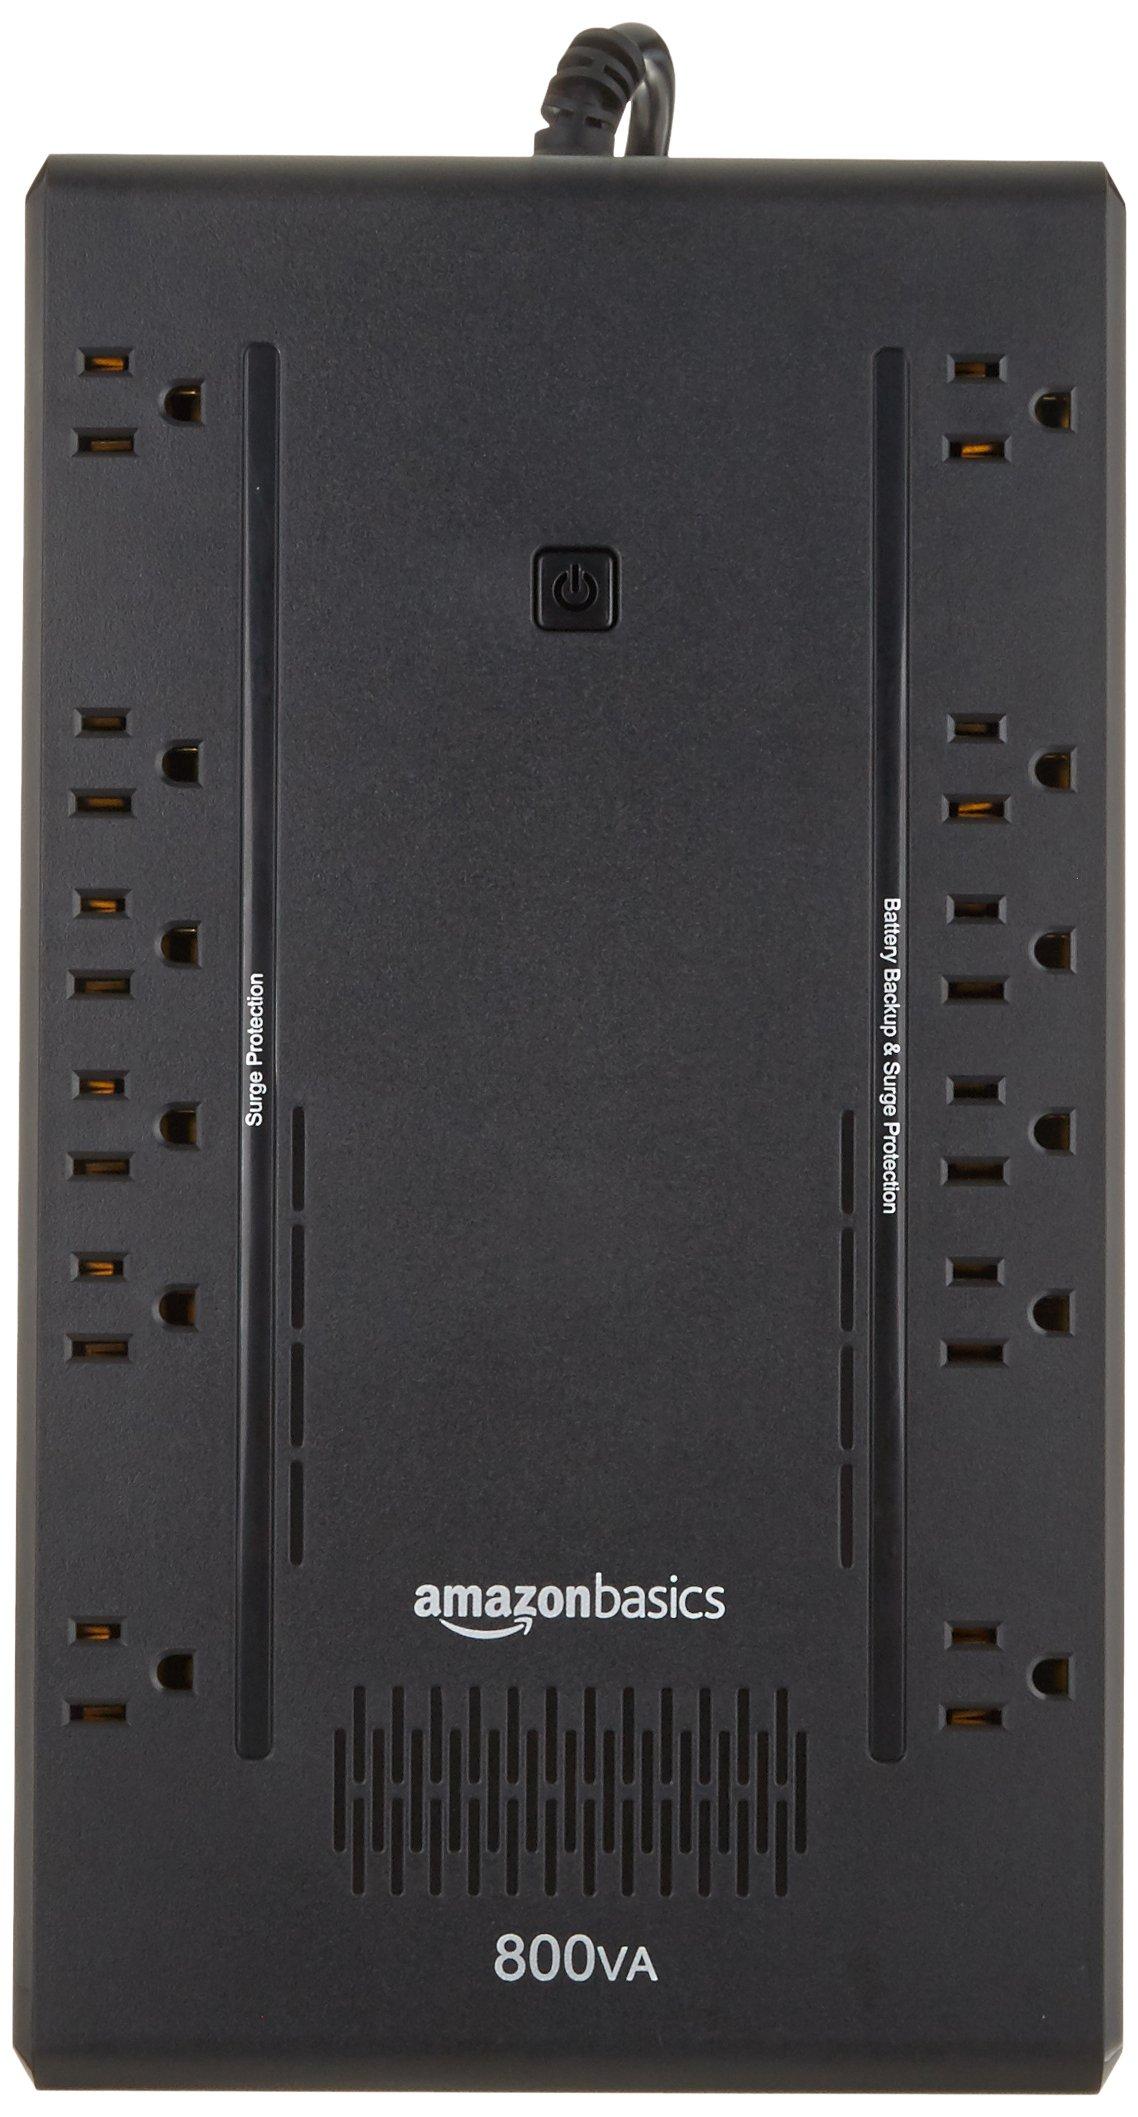 AmazonBasics Standby UPS 800VA 450W, 12 Outlets by AmazonBasics (Image #2)